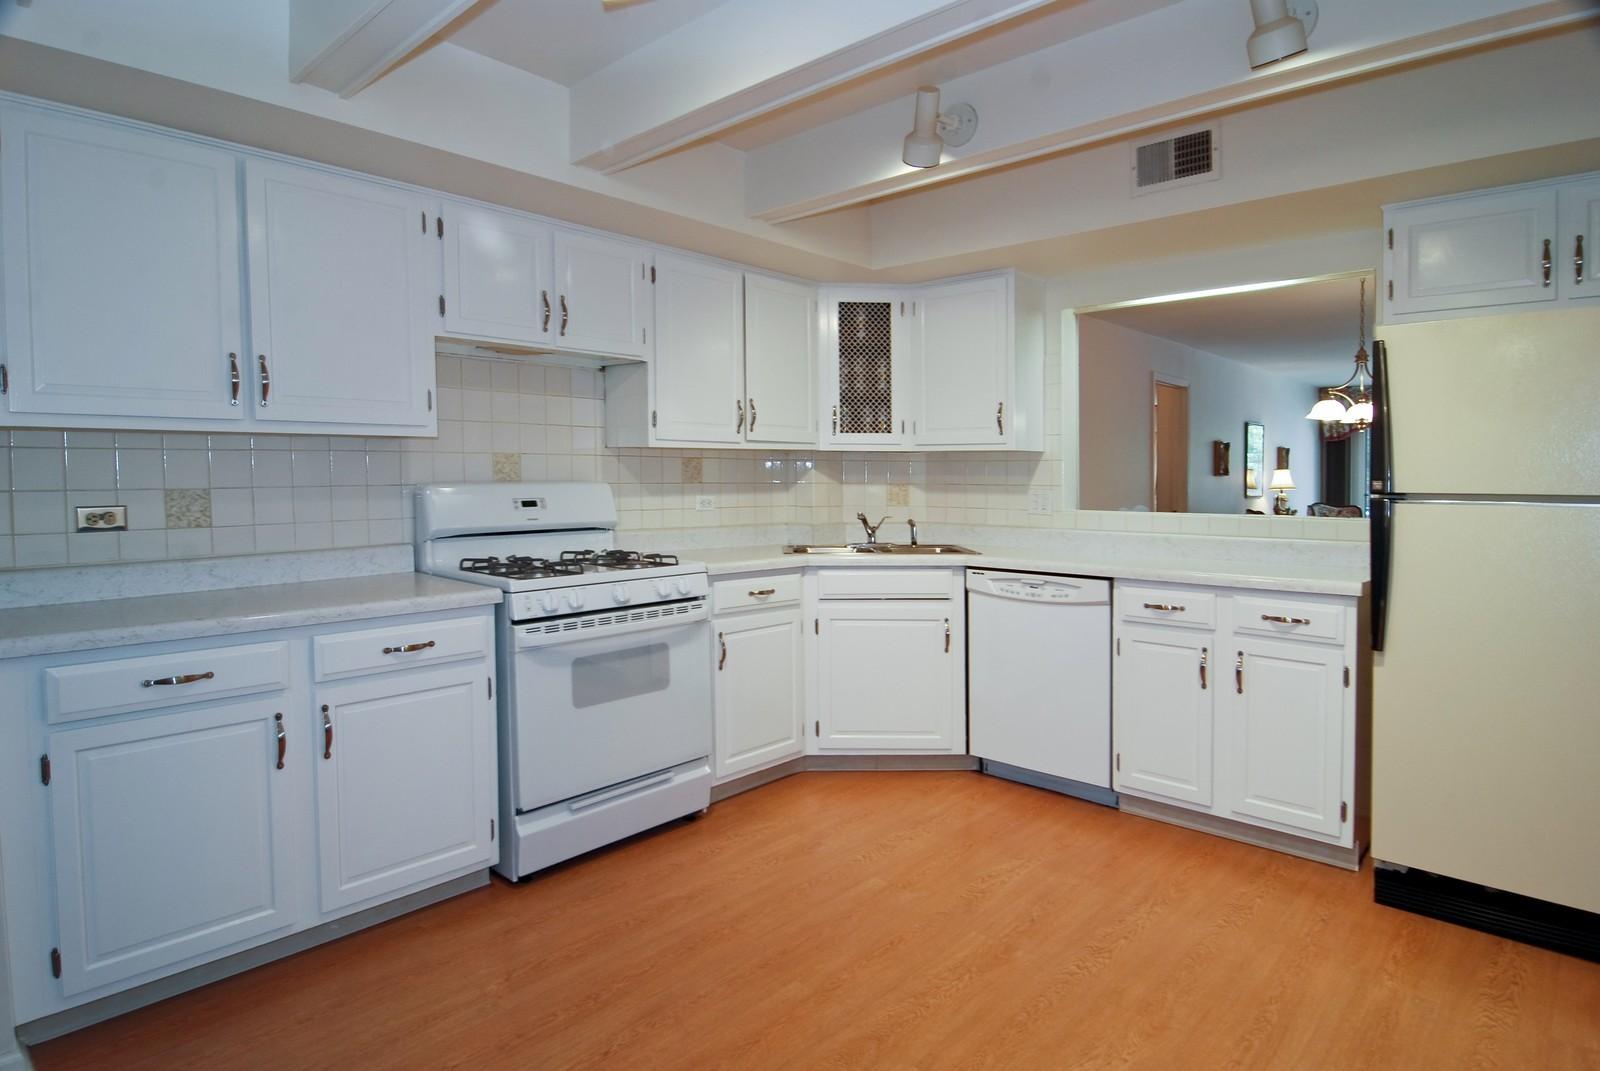 Real Estate Photography - 411 Ashland, Unit 2B, River Forest, IL, 60305 - Kitchen